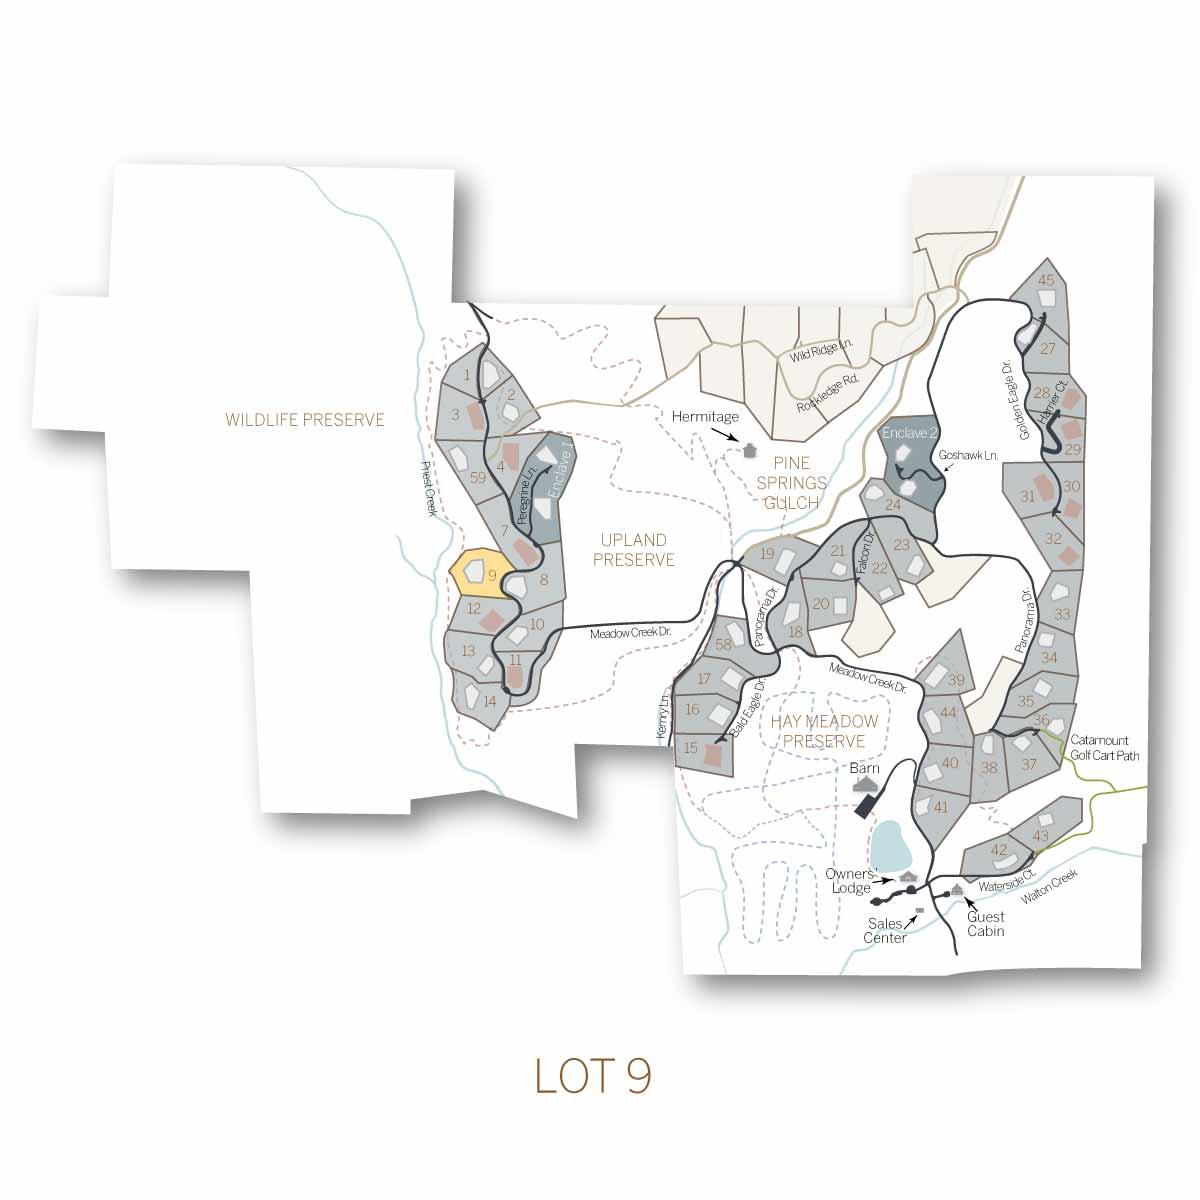 lot 9 1 - Homesite #9